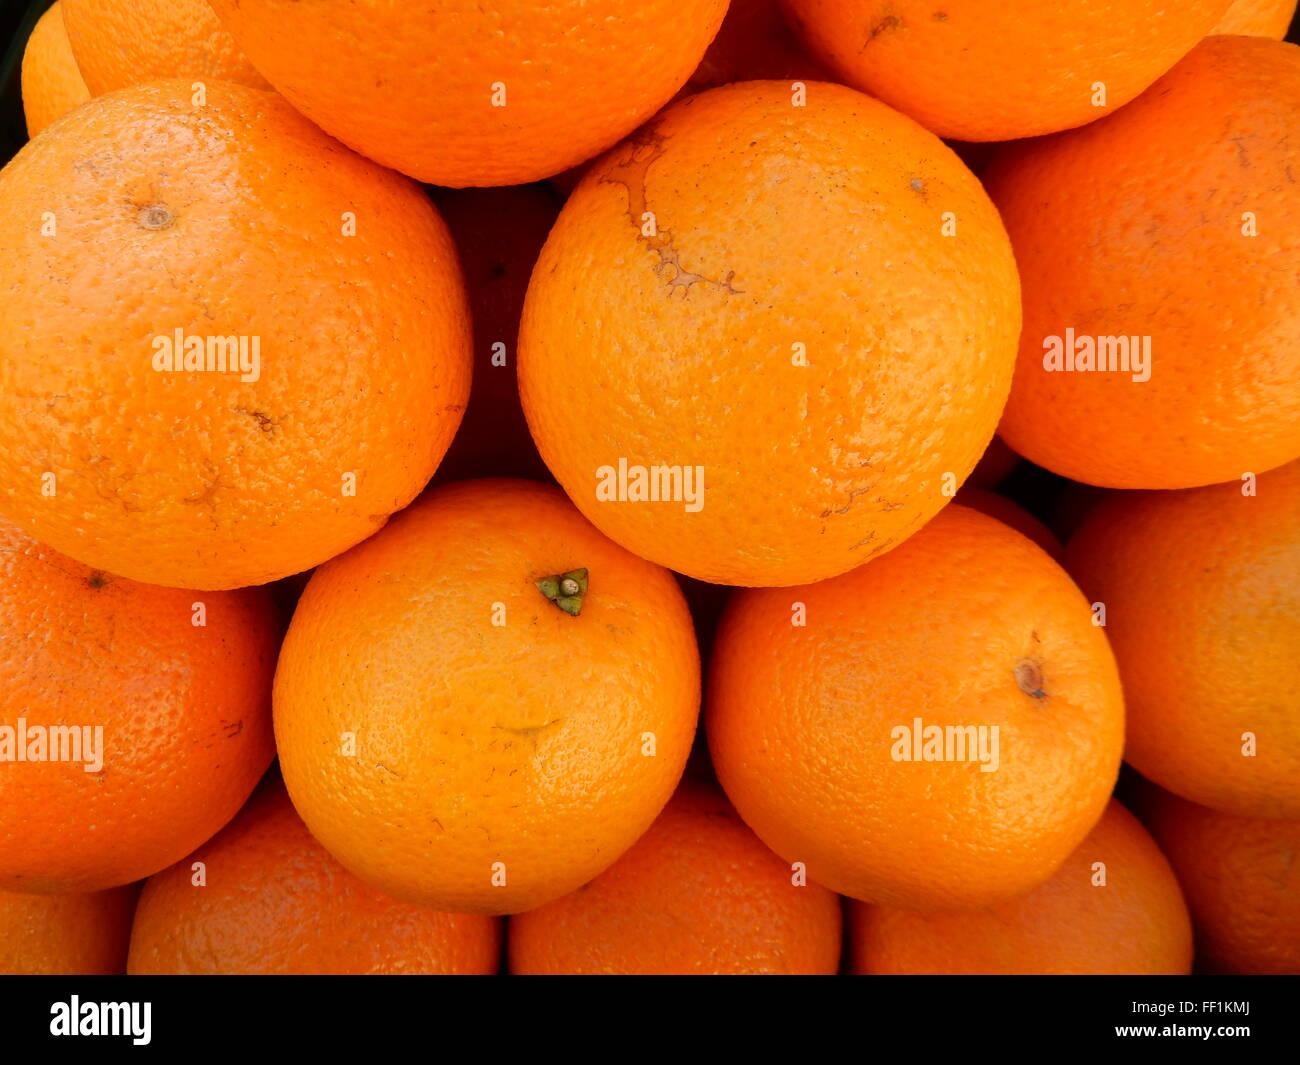 oranges on the market place - Stock Image